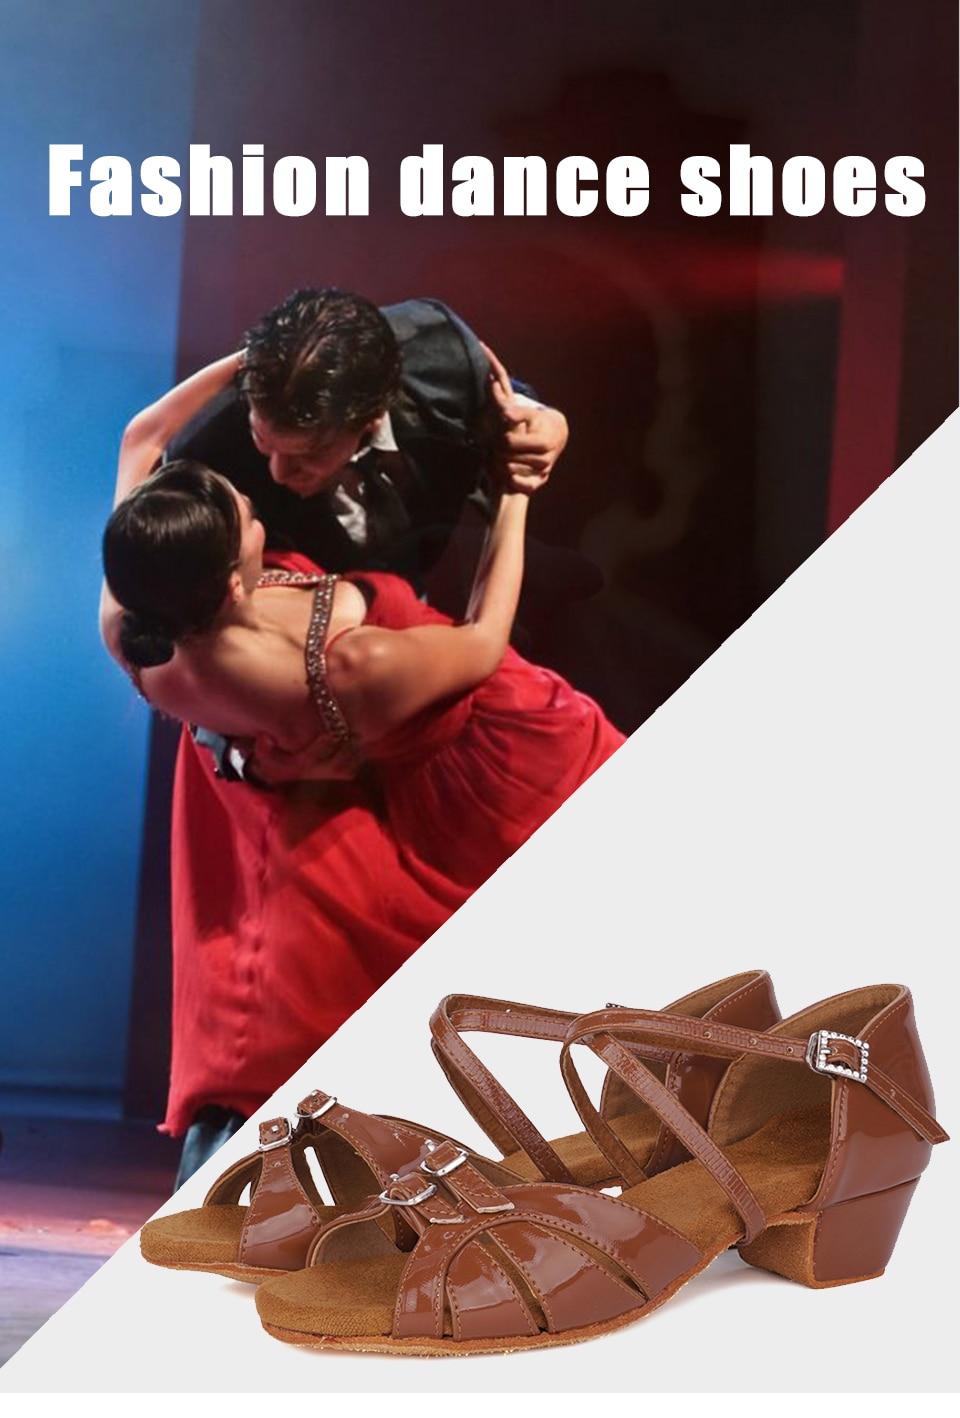 HIPPOSEUS Womens Ballroom Latin Standard Heeled Dance Shoes Sandals Suede Sole Heel 5CM//7CM,Model WZSP805